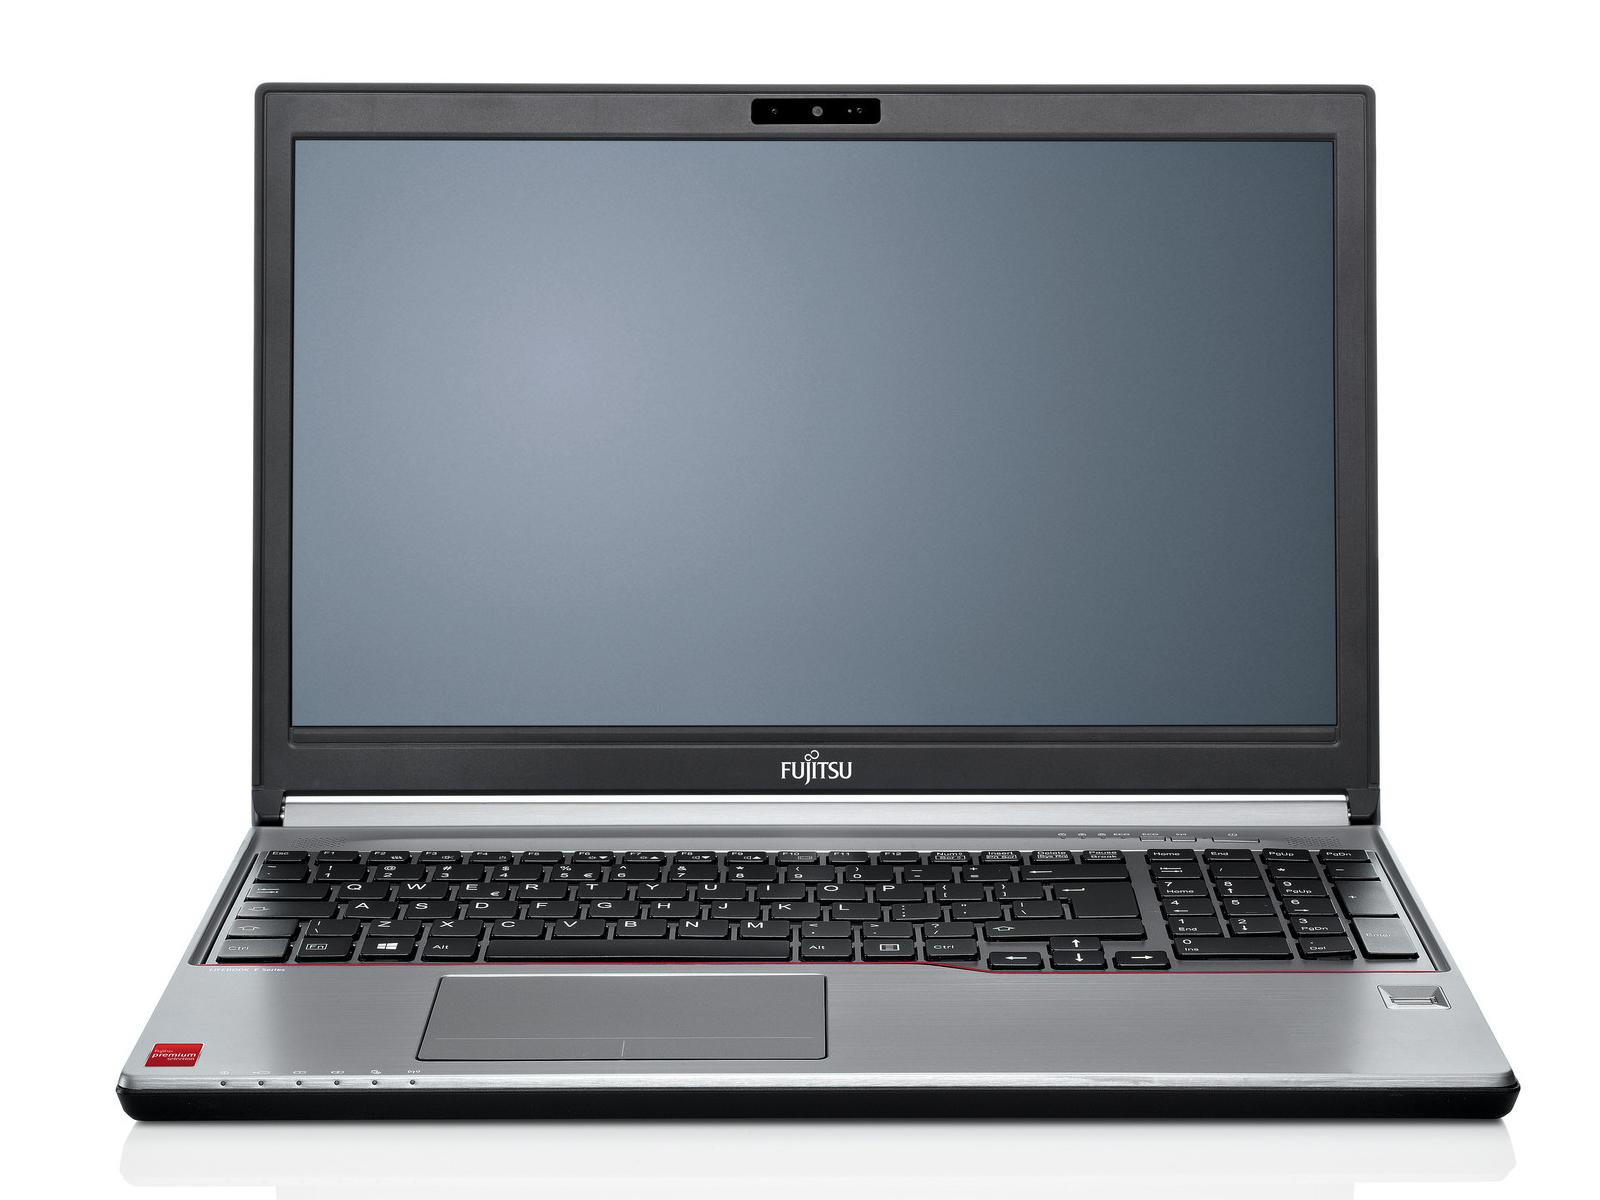 Laptop FUJITSU SIEMENS Lifebook E754, Intel Core i5-4200M 2.50GHz, 4GB DDR3, 120GB SSD, DVD-RW, 15.6 Inch, Tastatura Numerica, Fara Webcam, Grad B